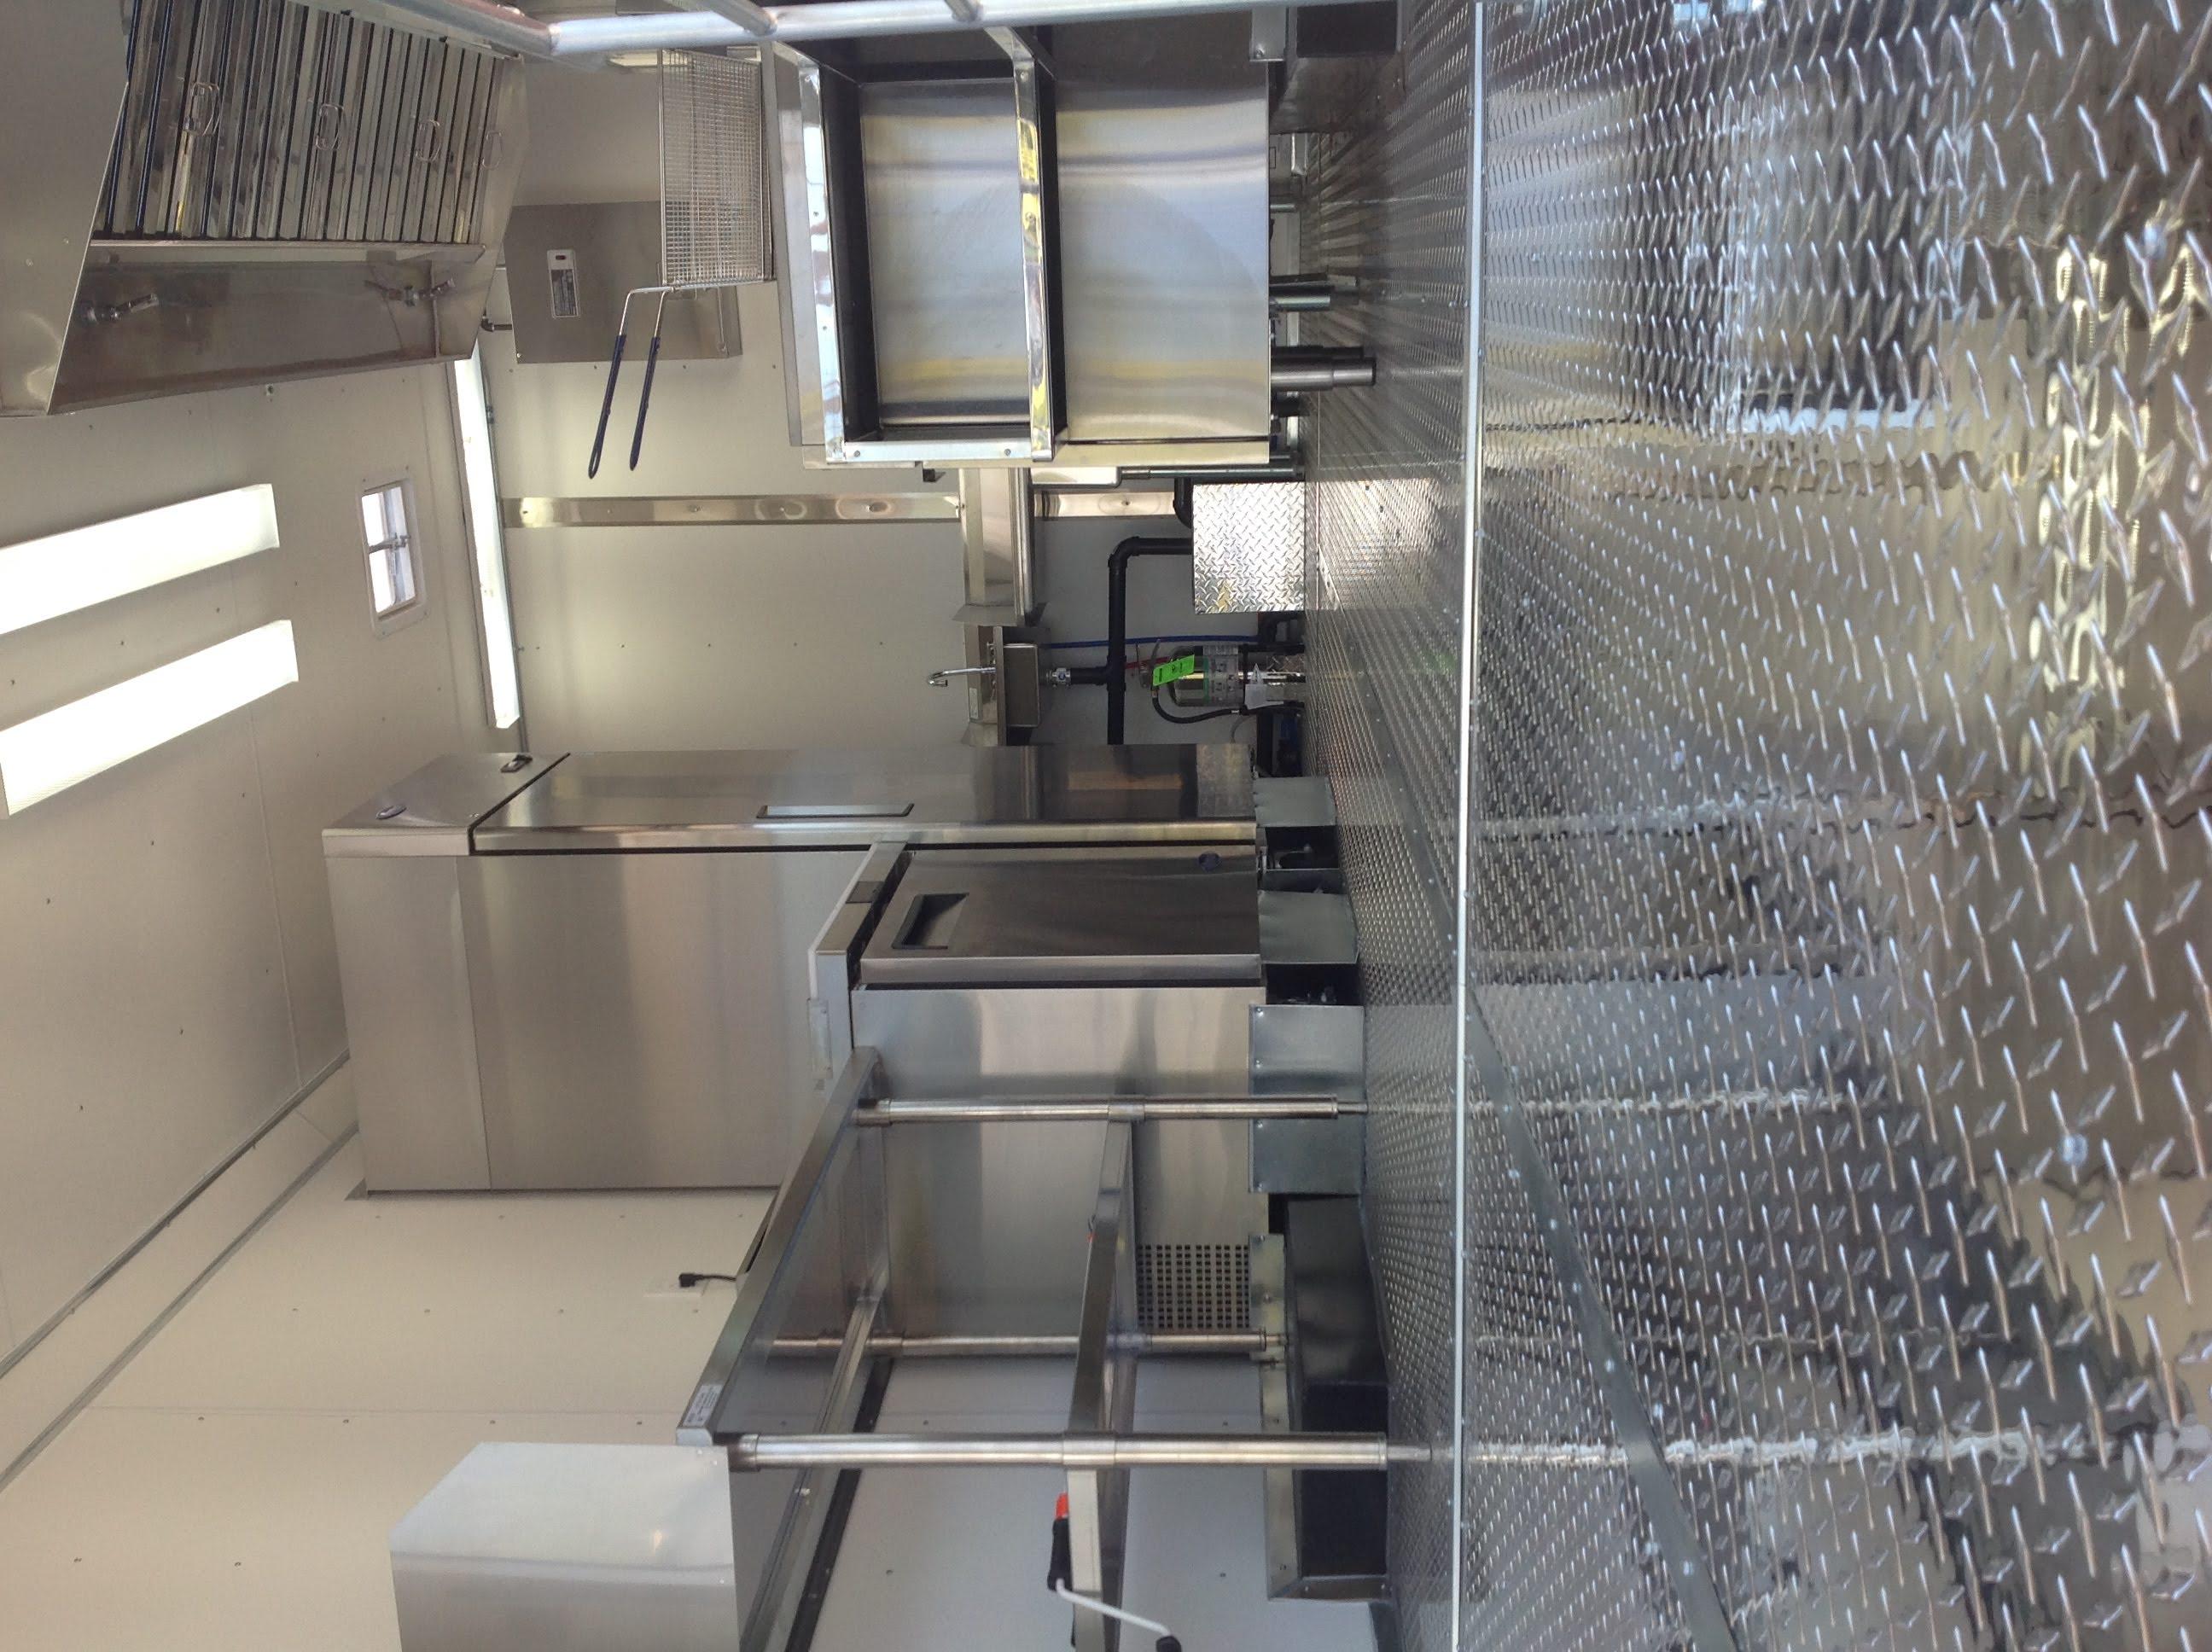 Idaho Concession Trailer Kitchen to Code